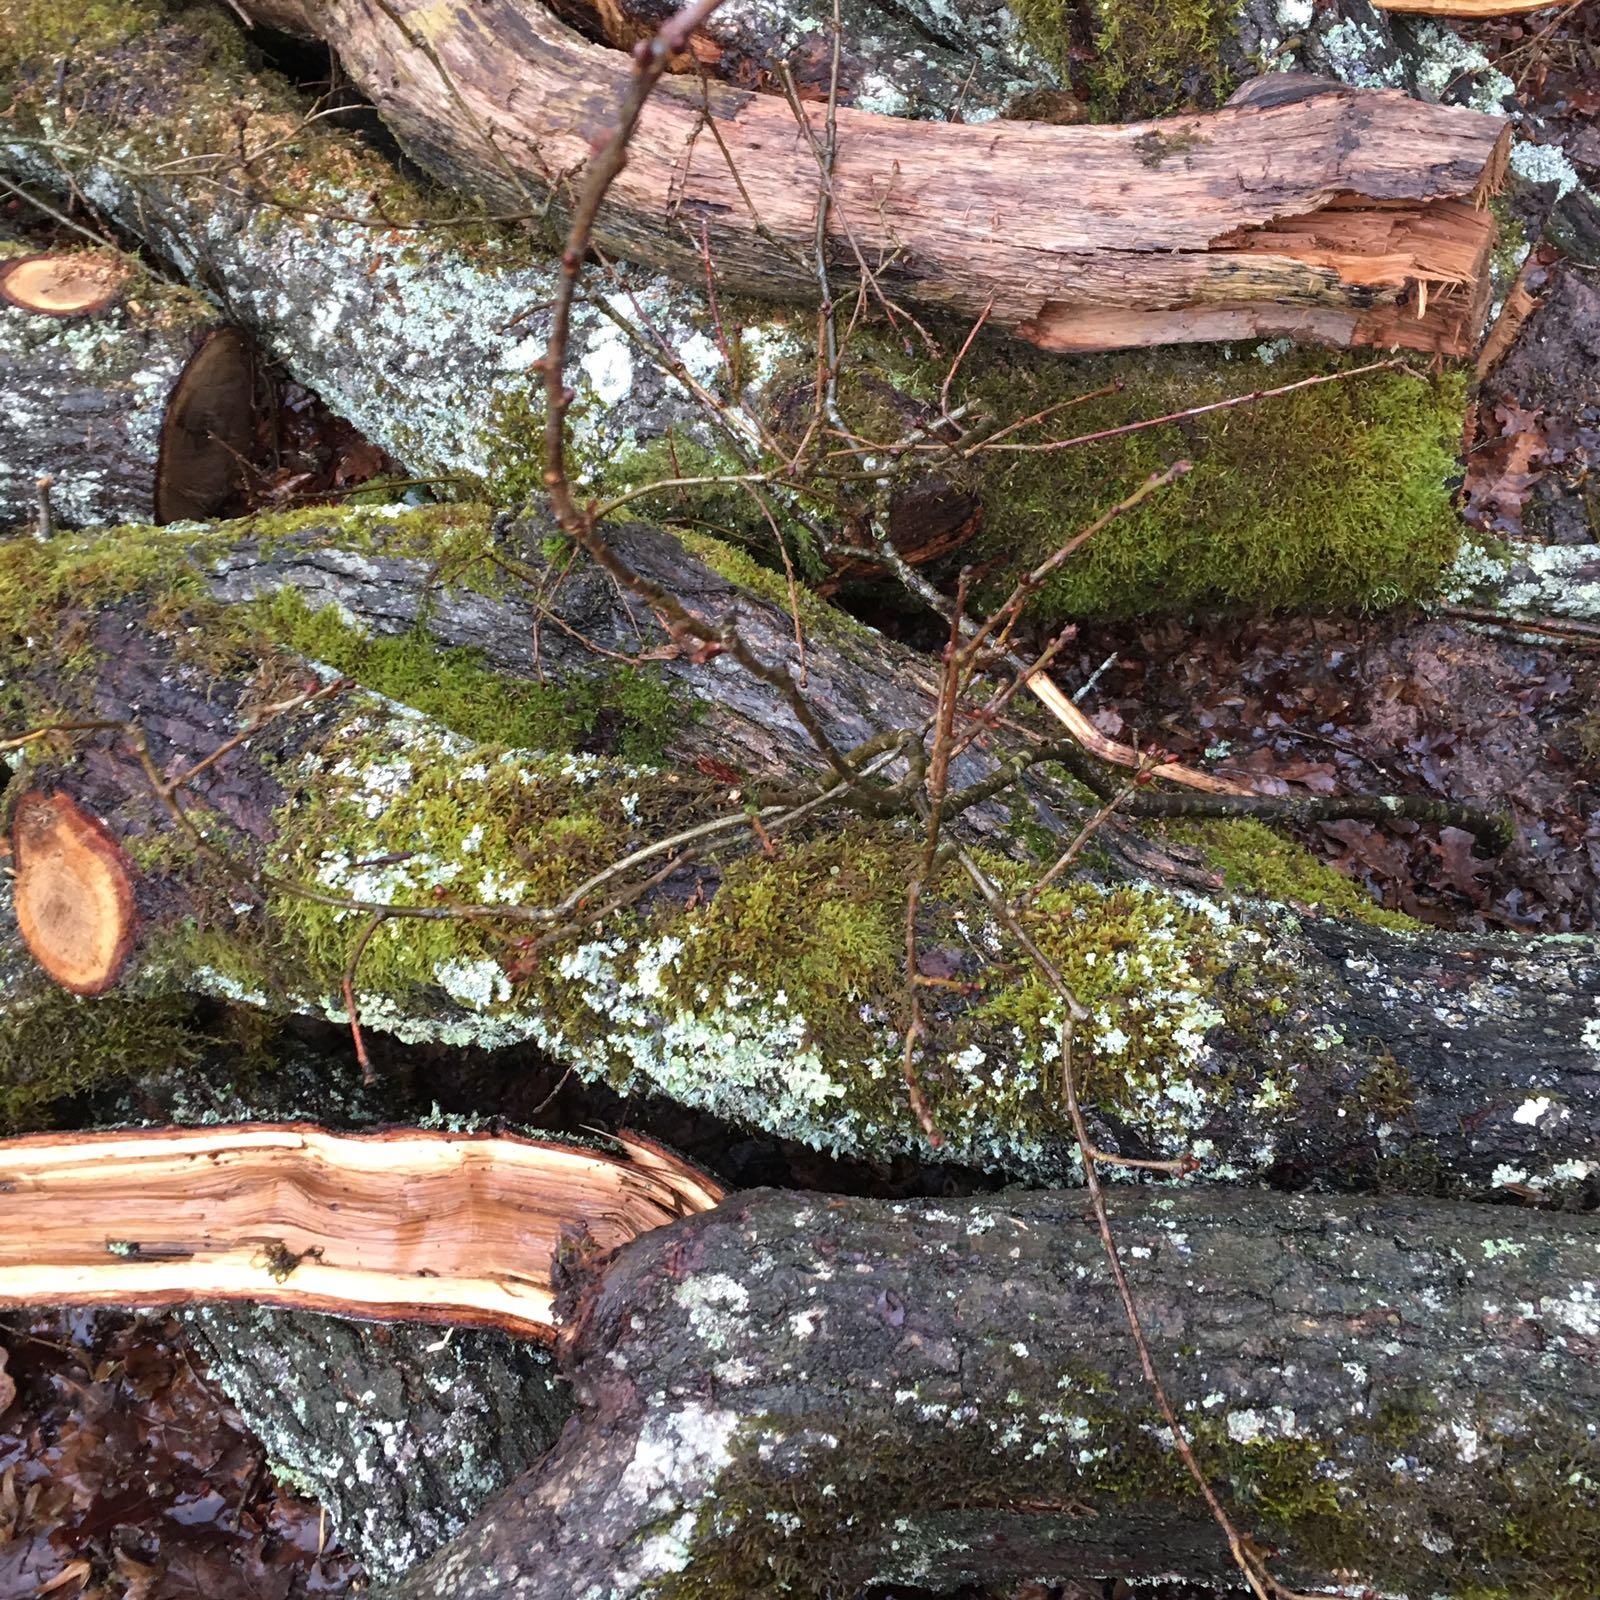 Stranded logs